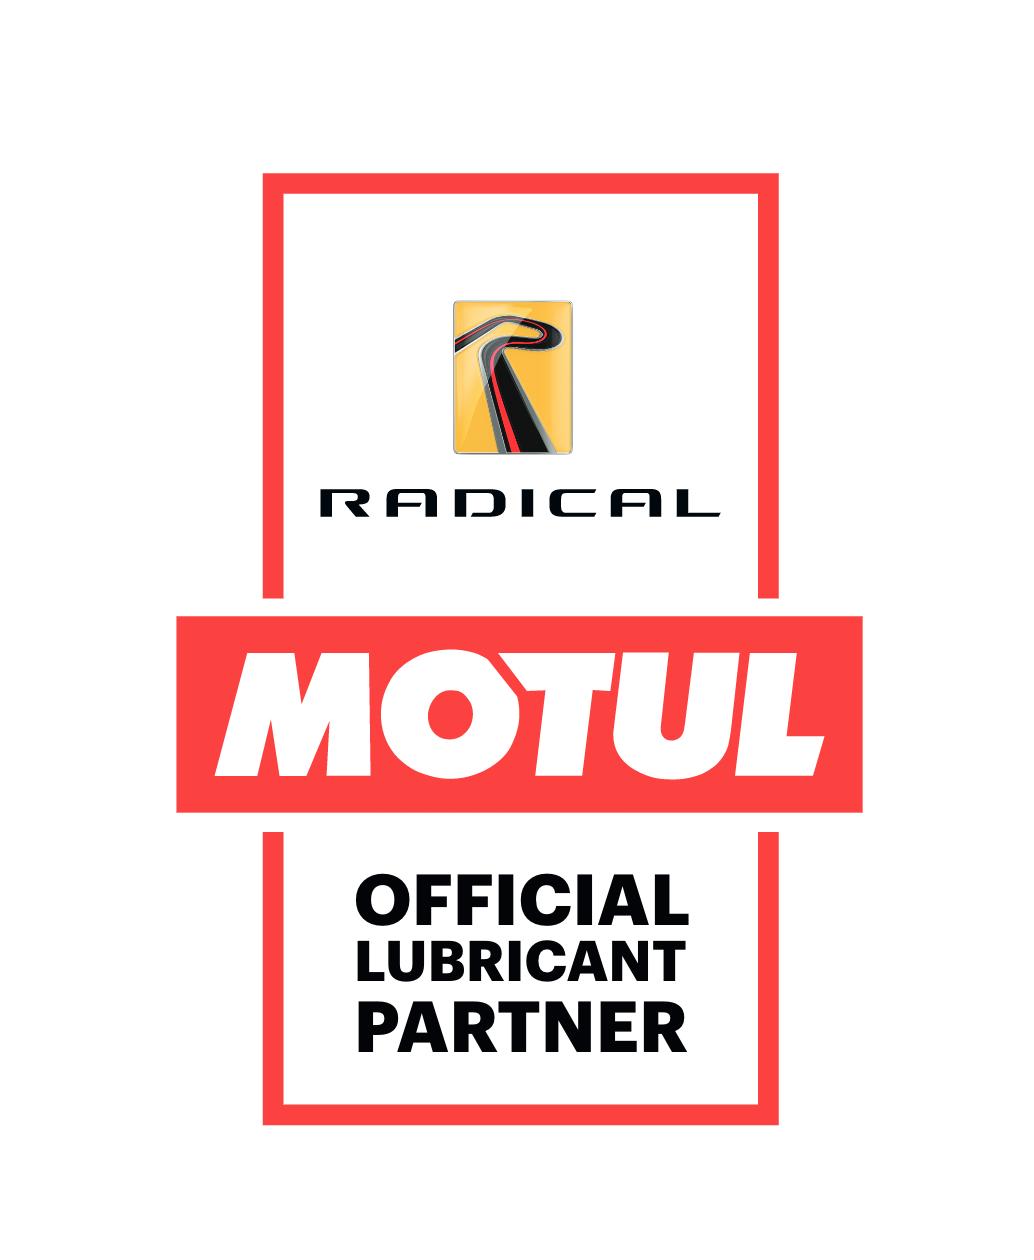 Motul Announces New Partnership with Radical